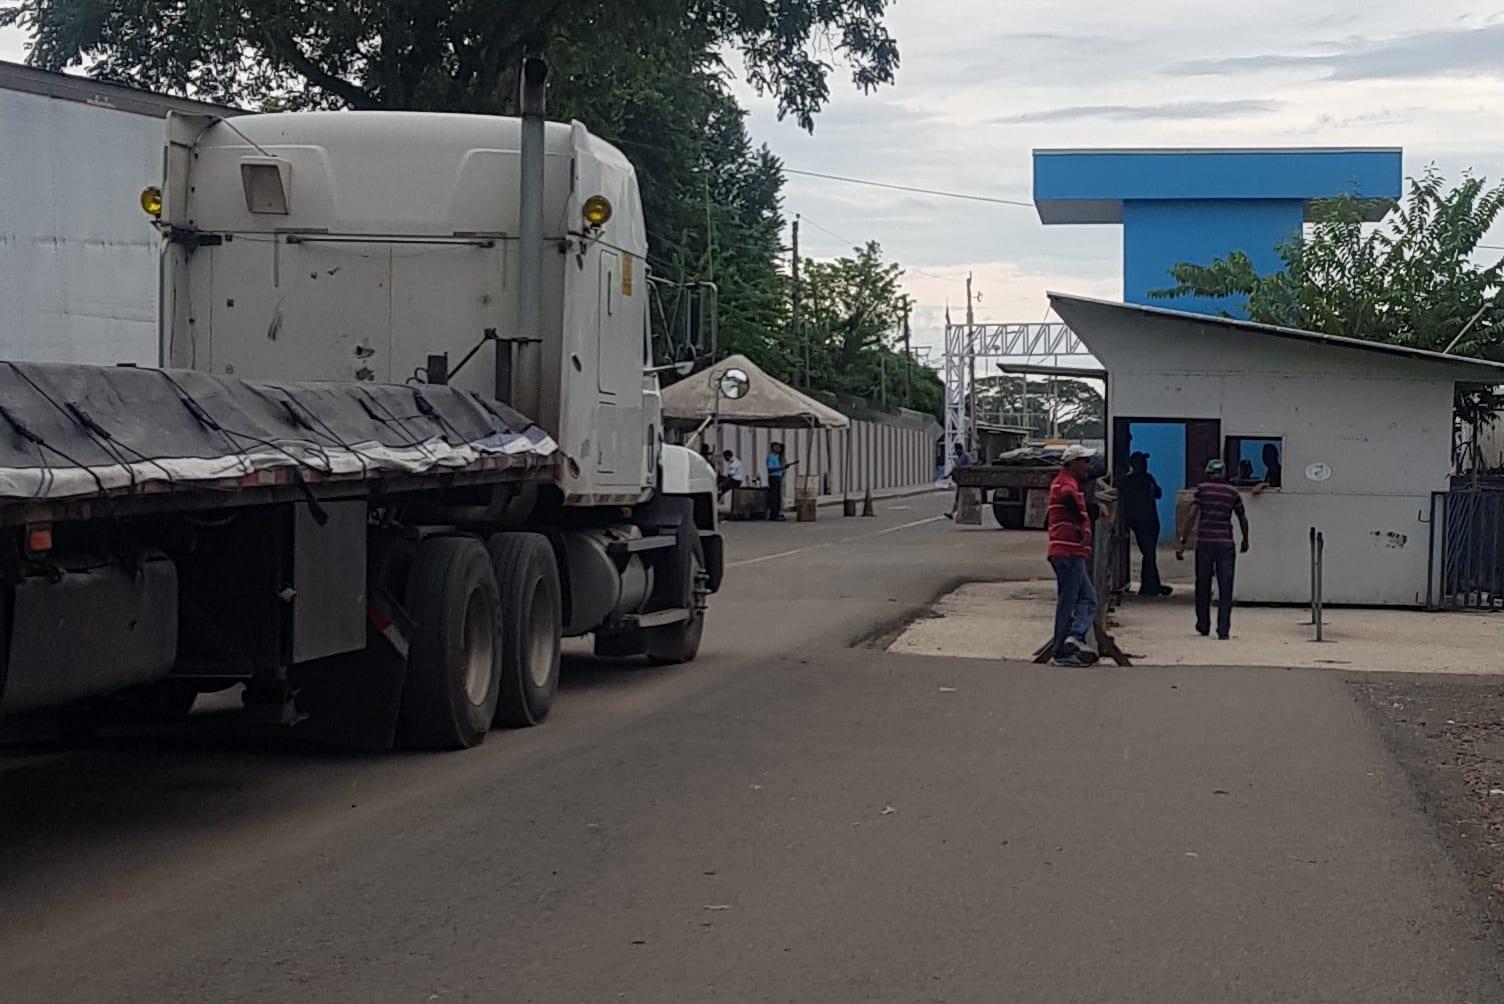 Border Crossing Costa Rica to Nicaragua - Costa Rica Passport Checkpoint